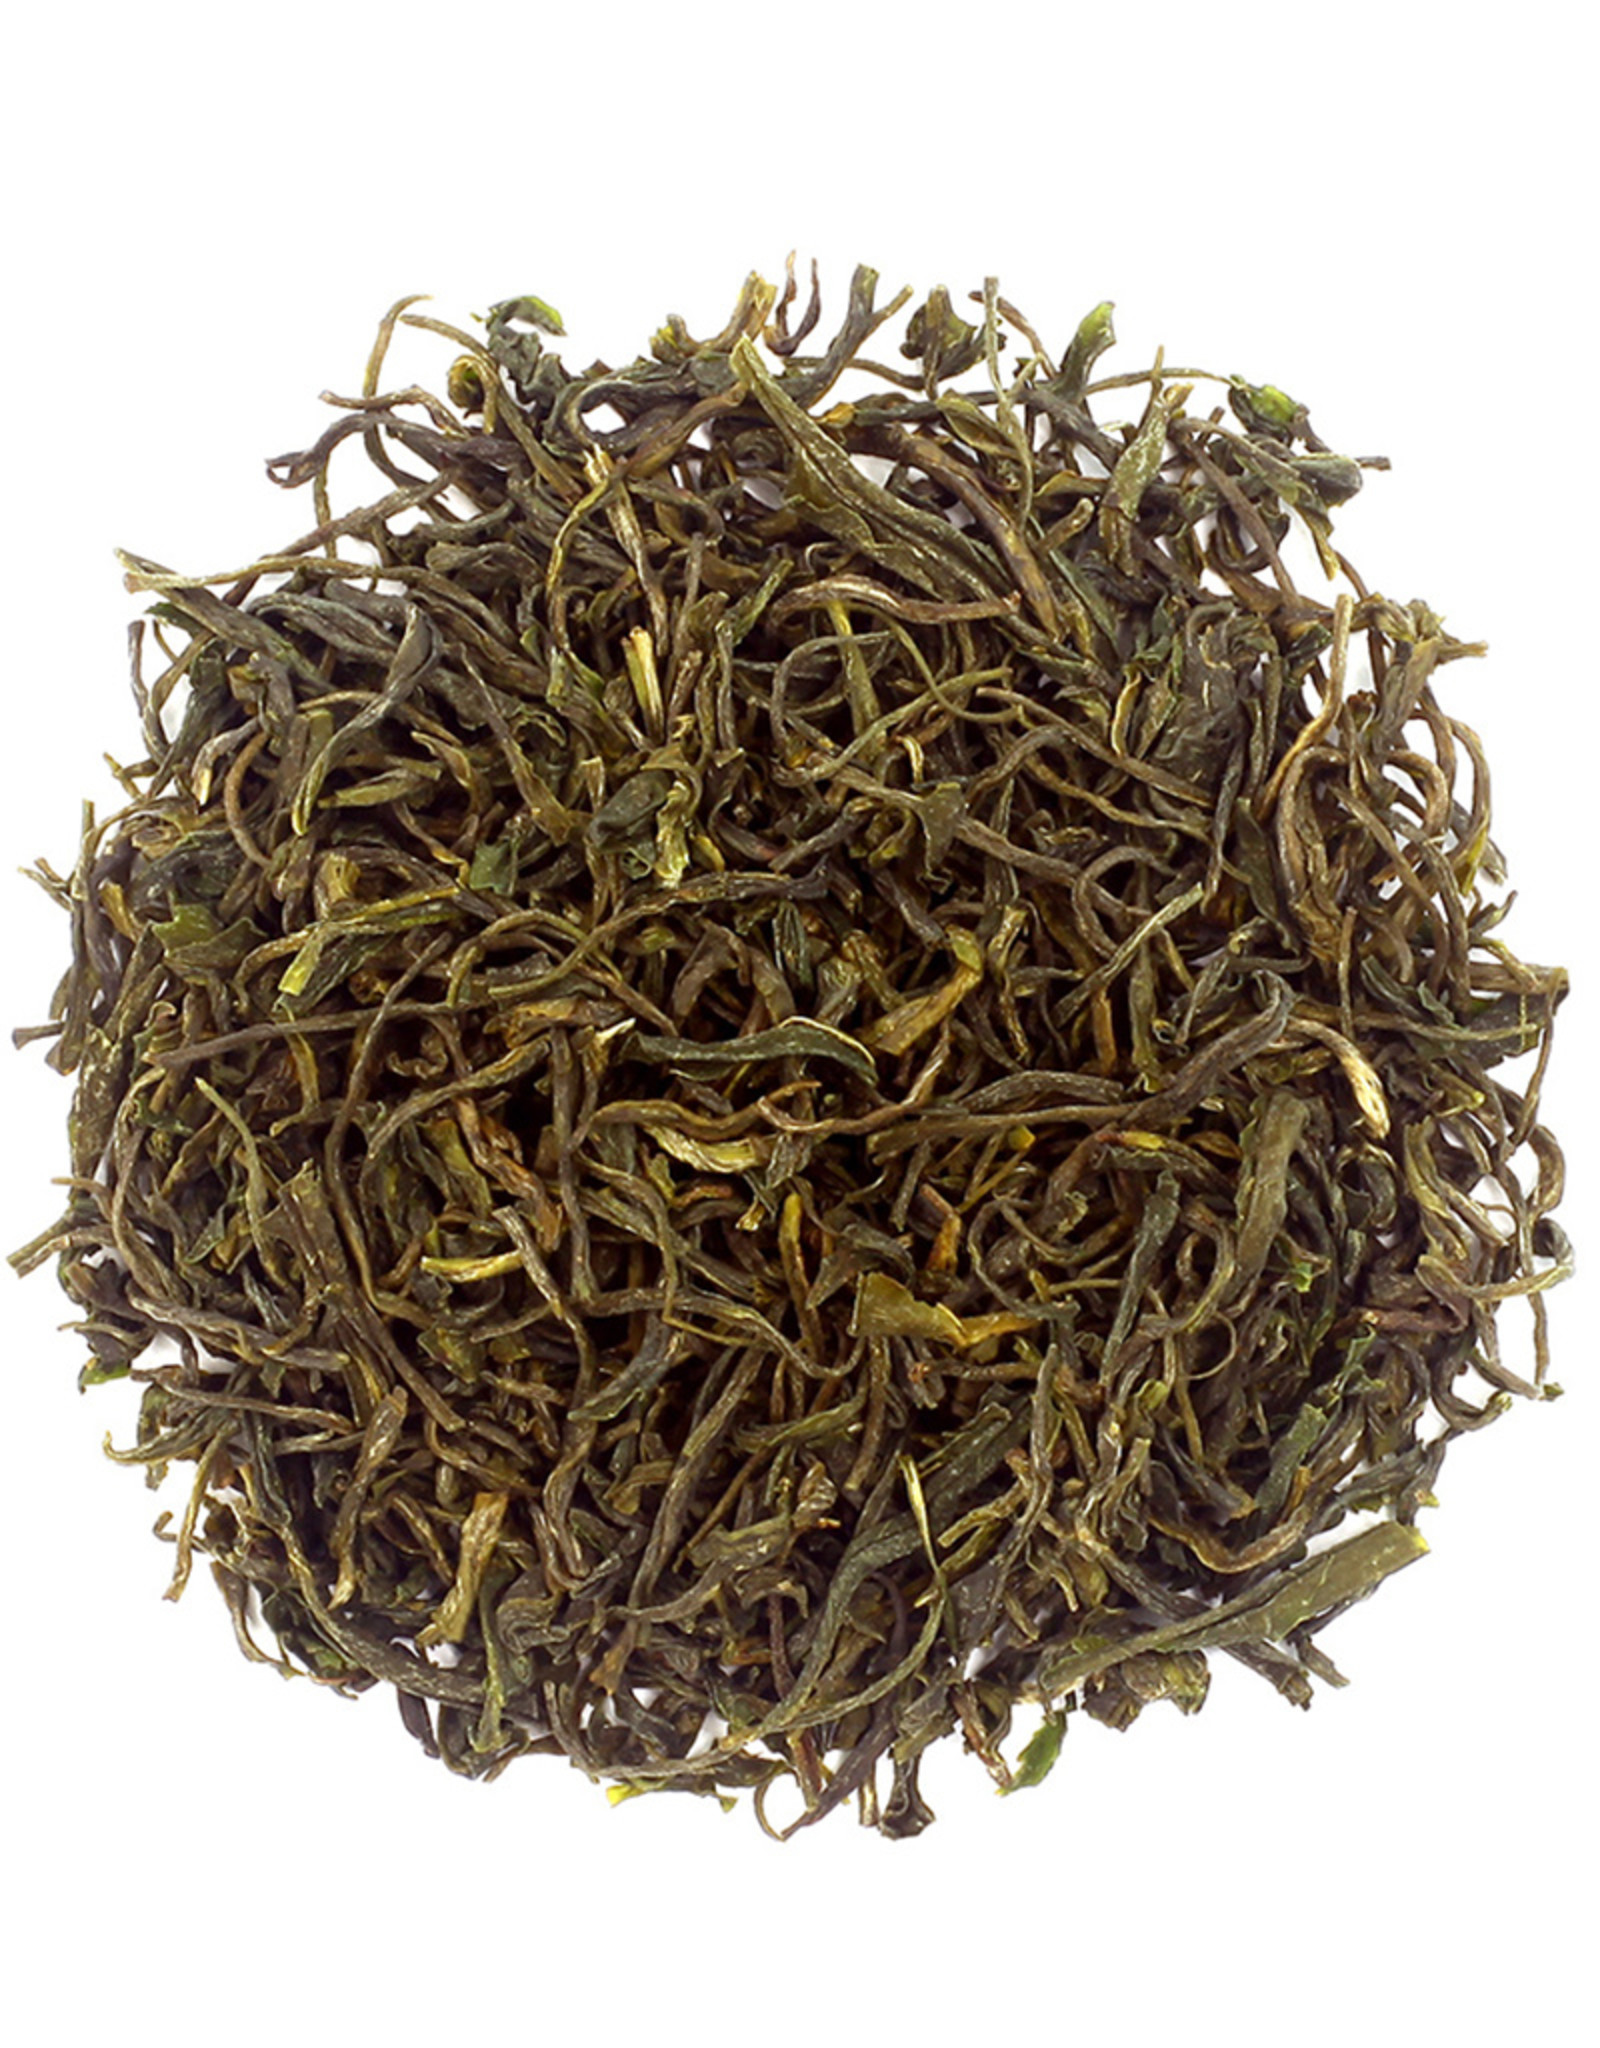 Or Tea? Mount Feather BIO - Groene thee